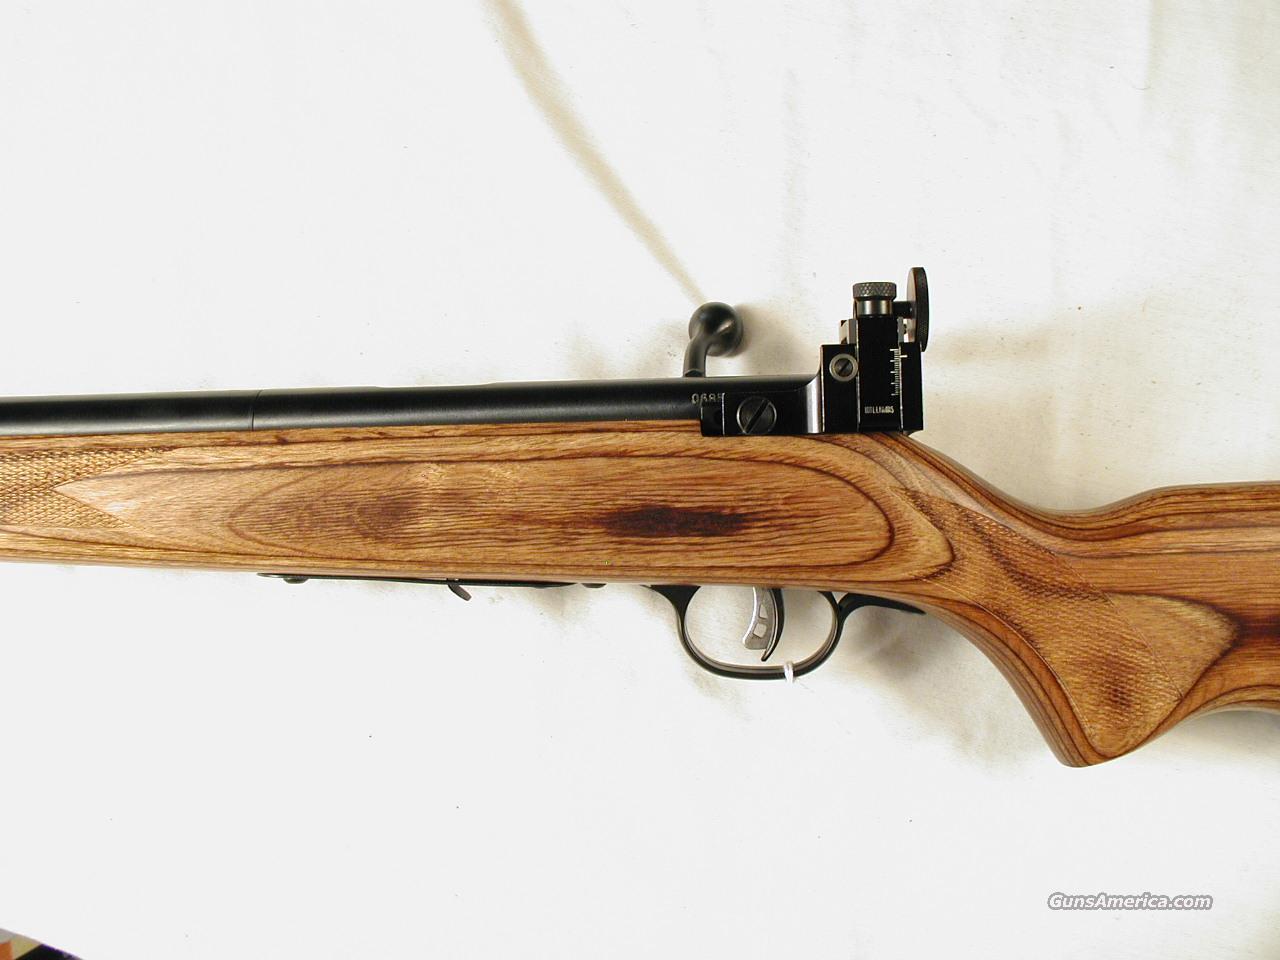 MKIIFVT TARGET 22LR   Guns > Rifles > Savage Rifles > Accutrigger Models